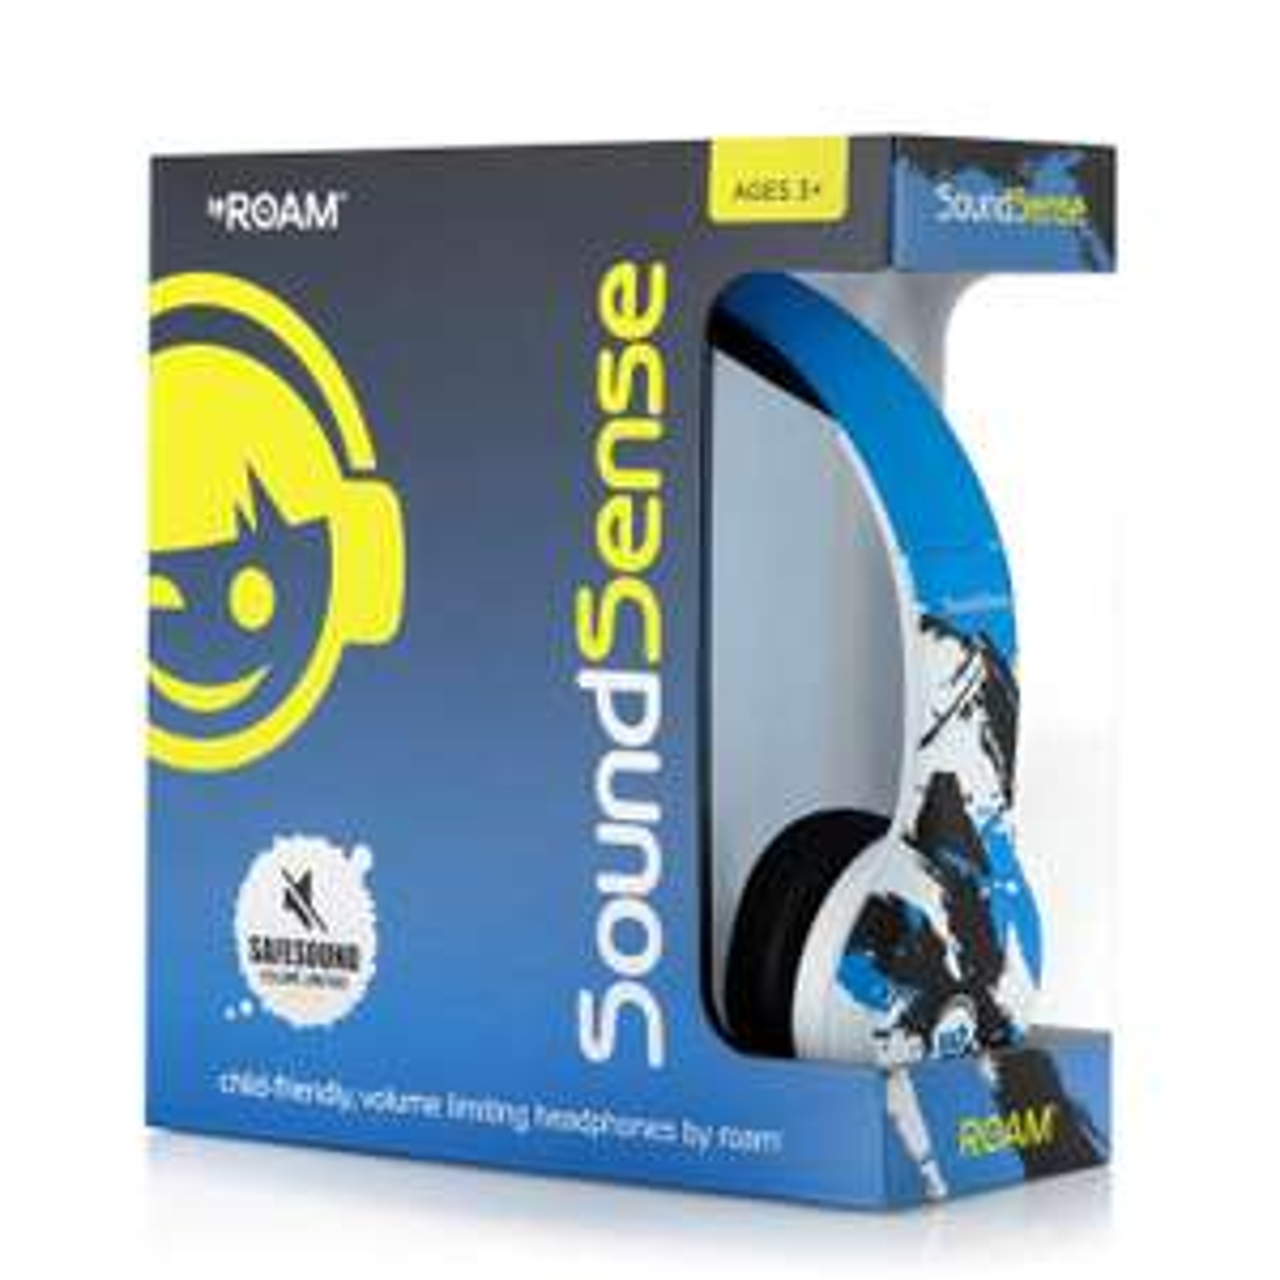 Roam Soundsense Headphones, great stocking filler £4.99 Free C&C @ HMV